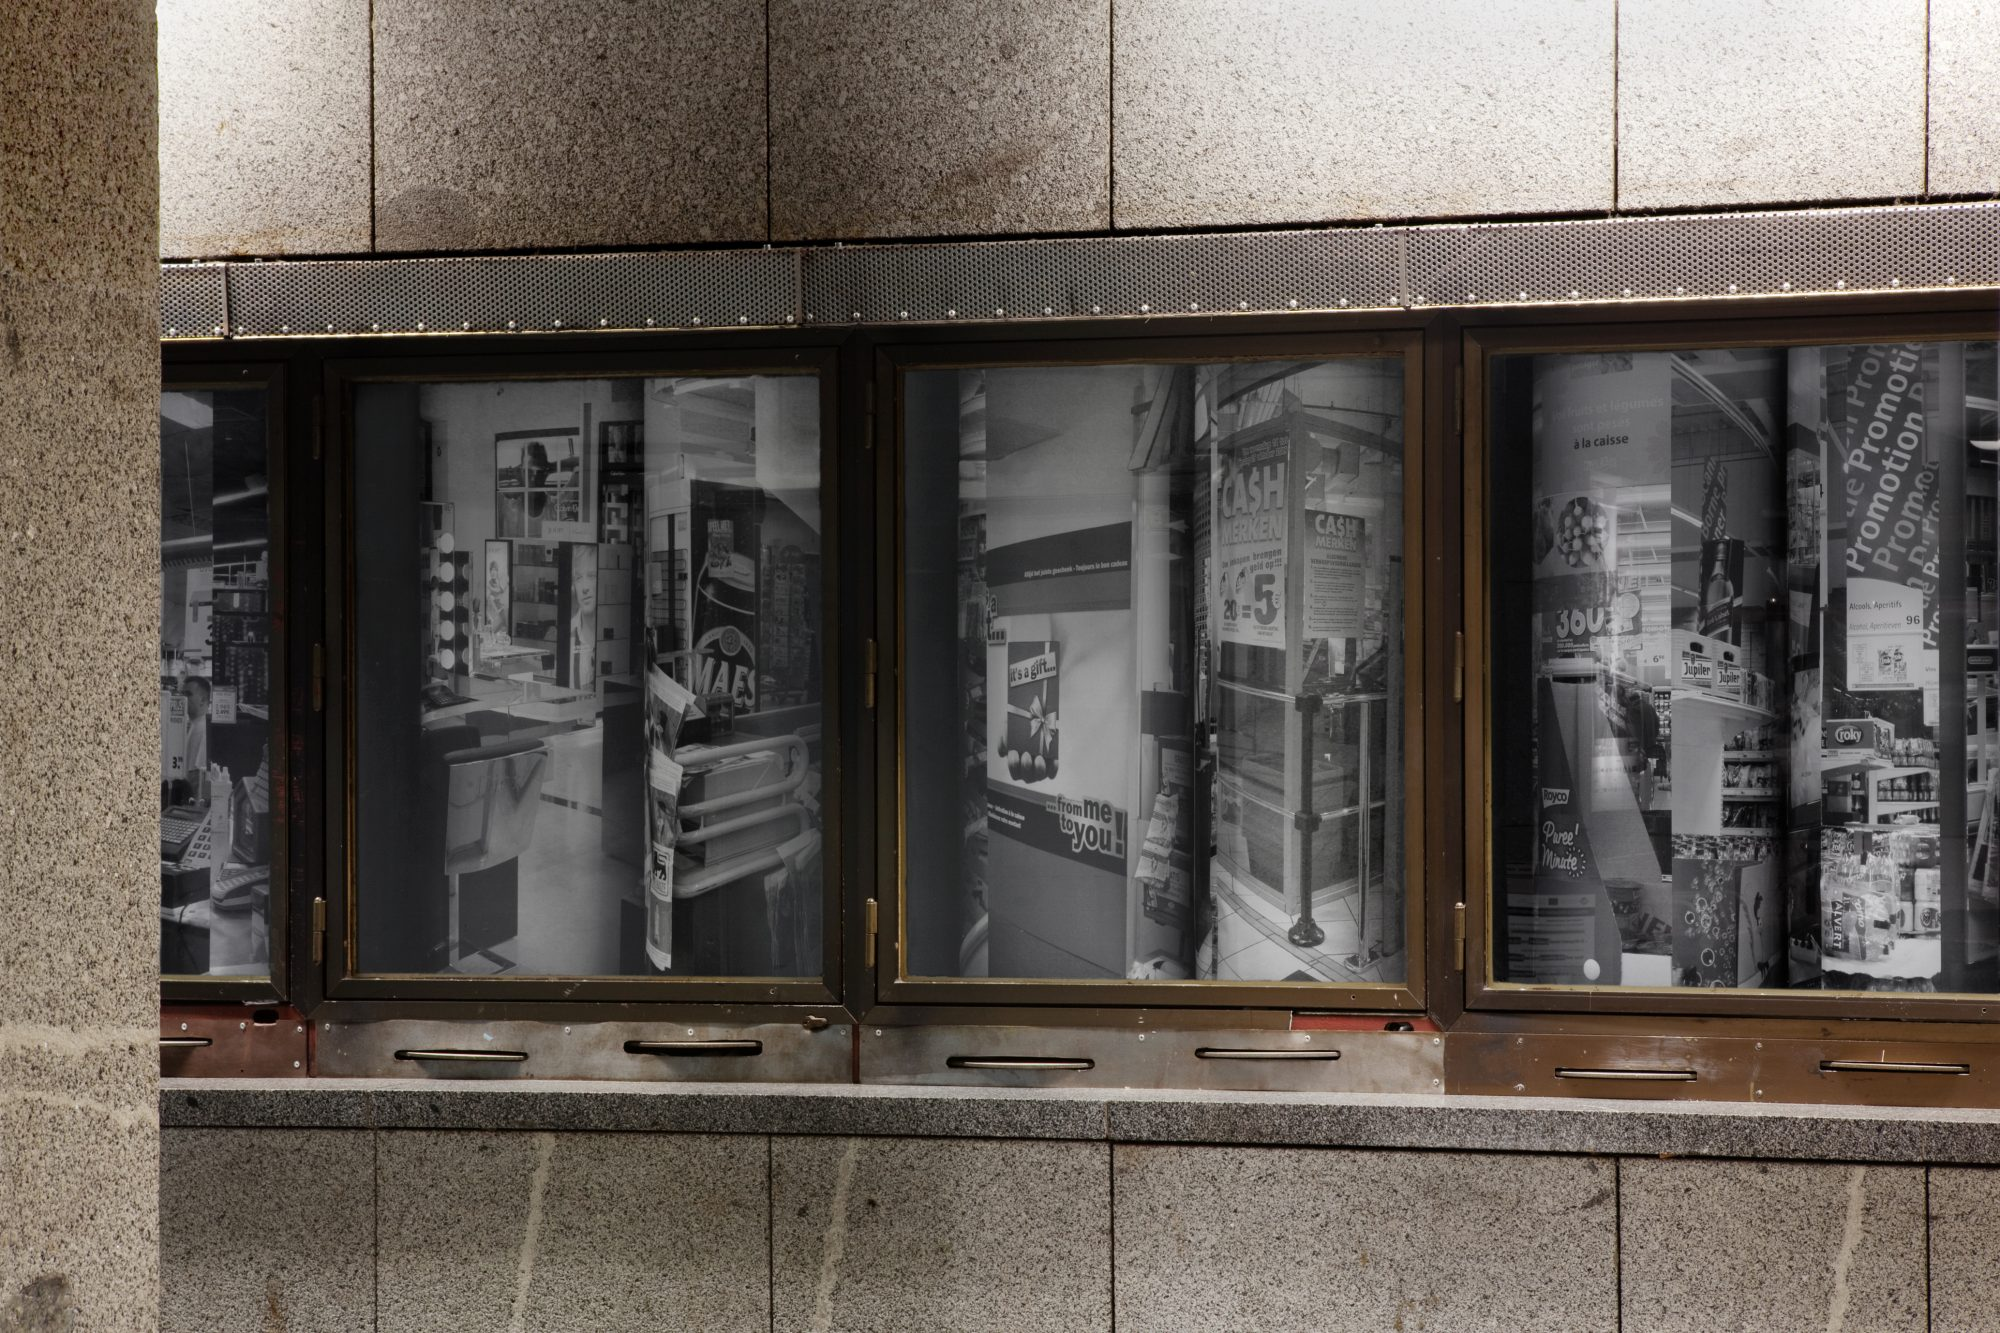 Capital Decor, Projektplus, Nádraží Holešovice, Prague (CZ), 2016<br /> 24 Xerox prints, 86 x 112 cm, mounted on 24 clynders